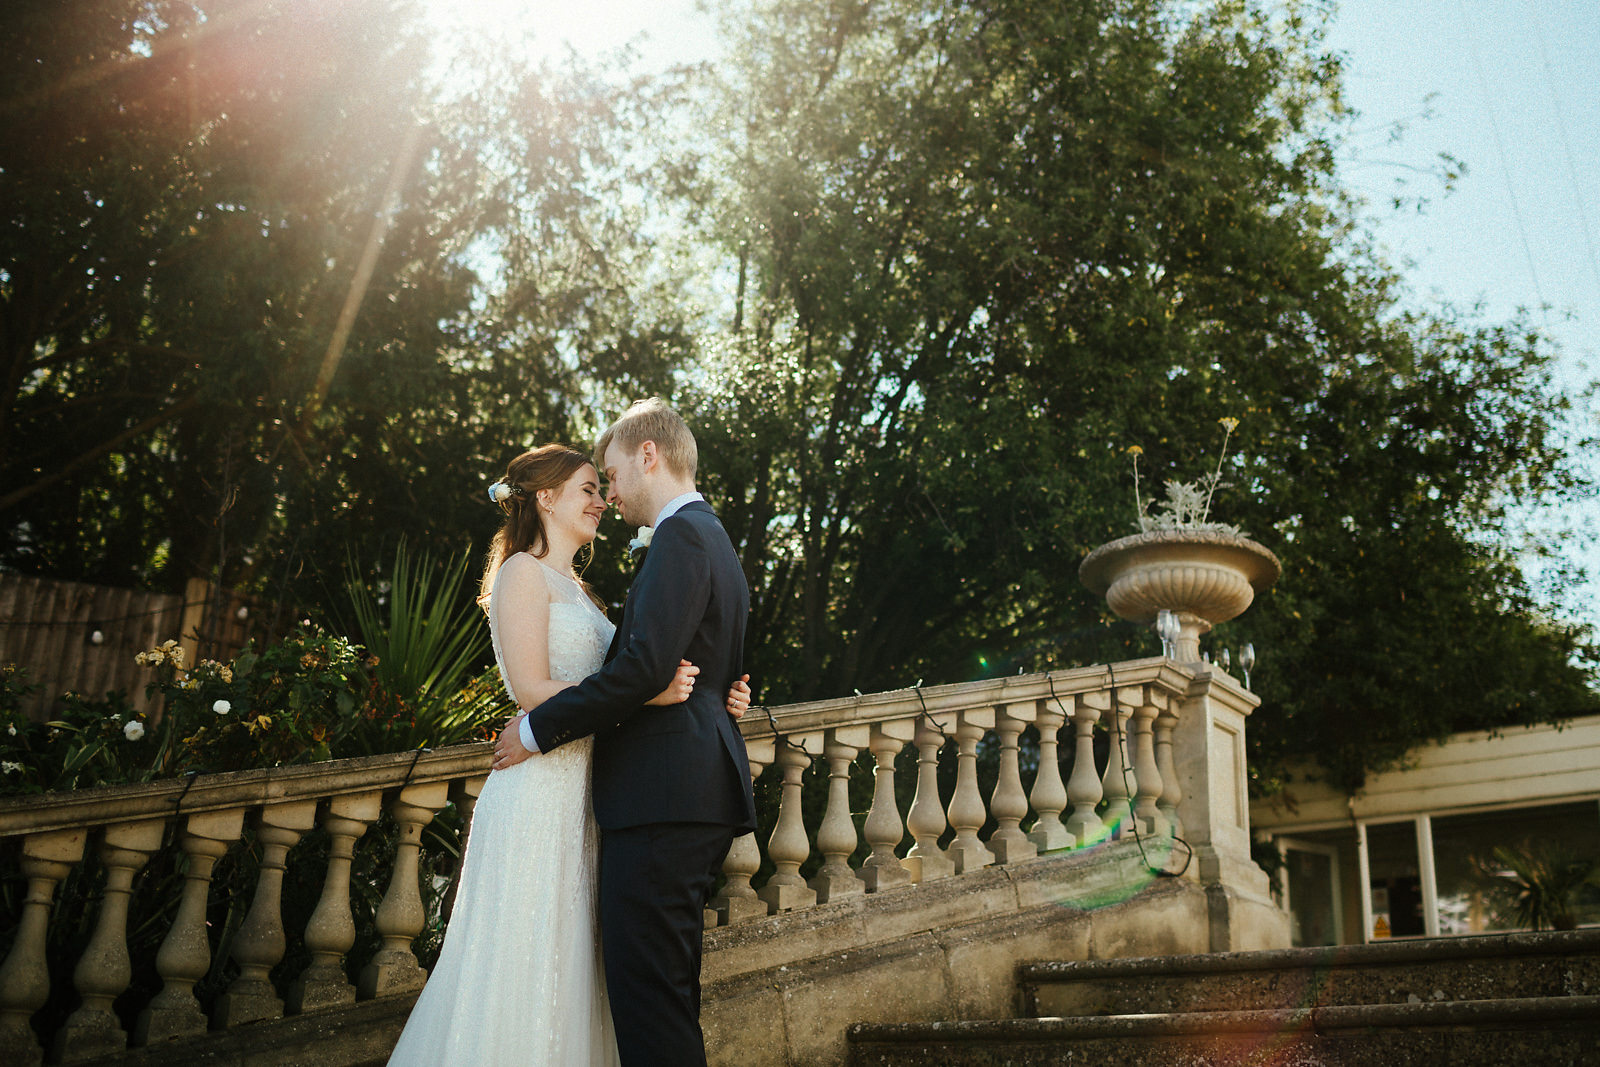 Sunny Surbiton wedding photos